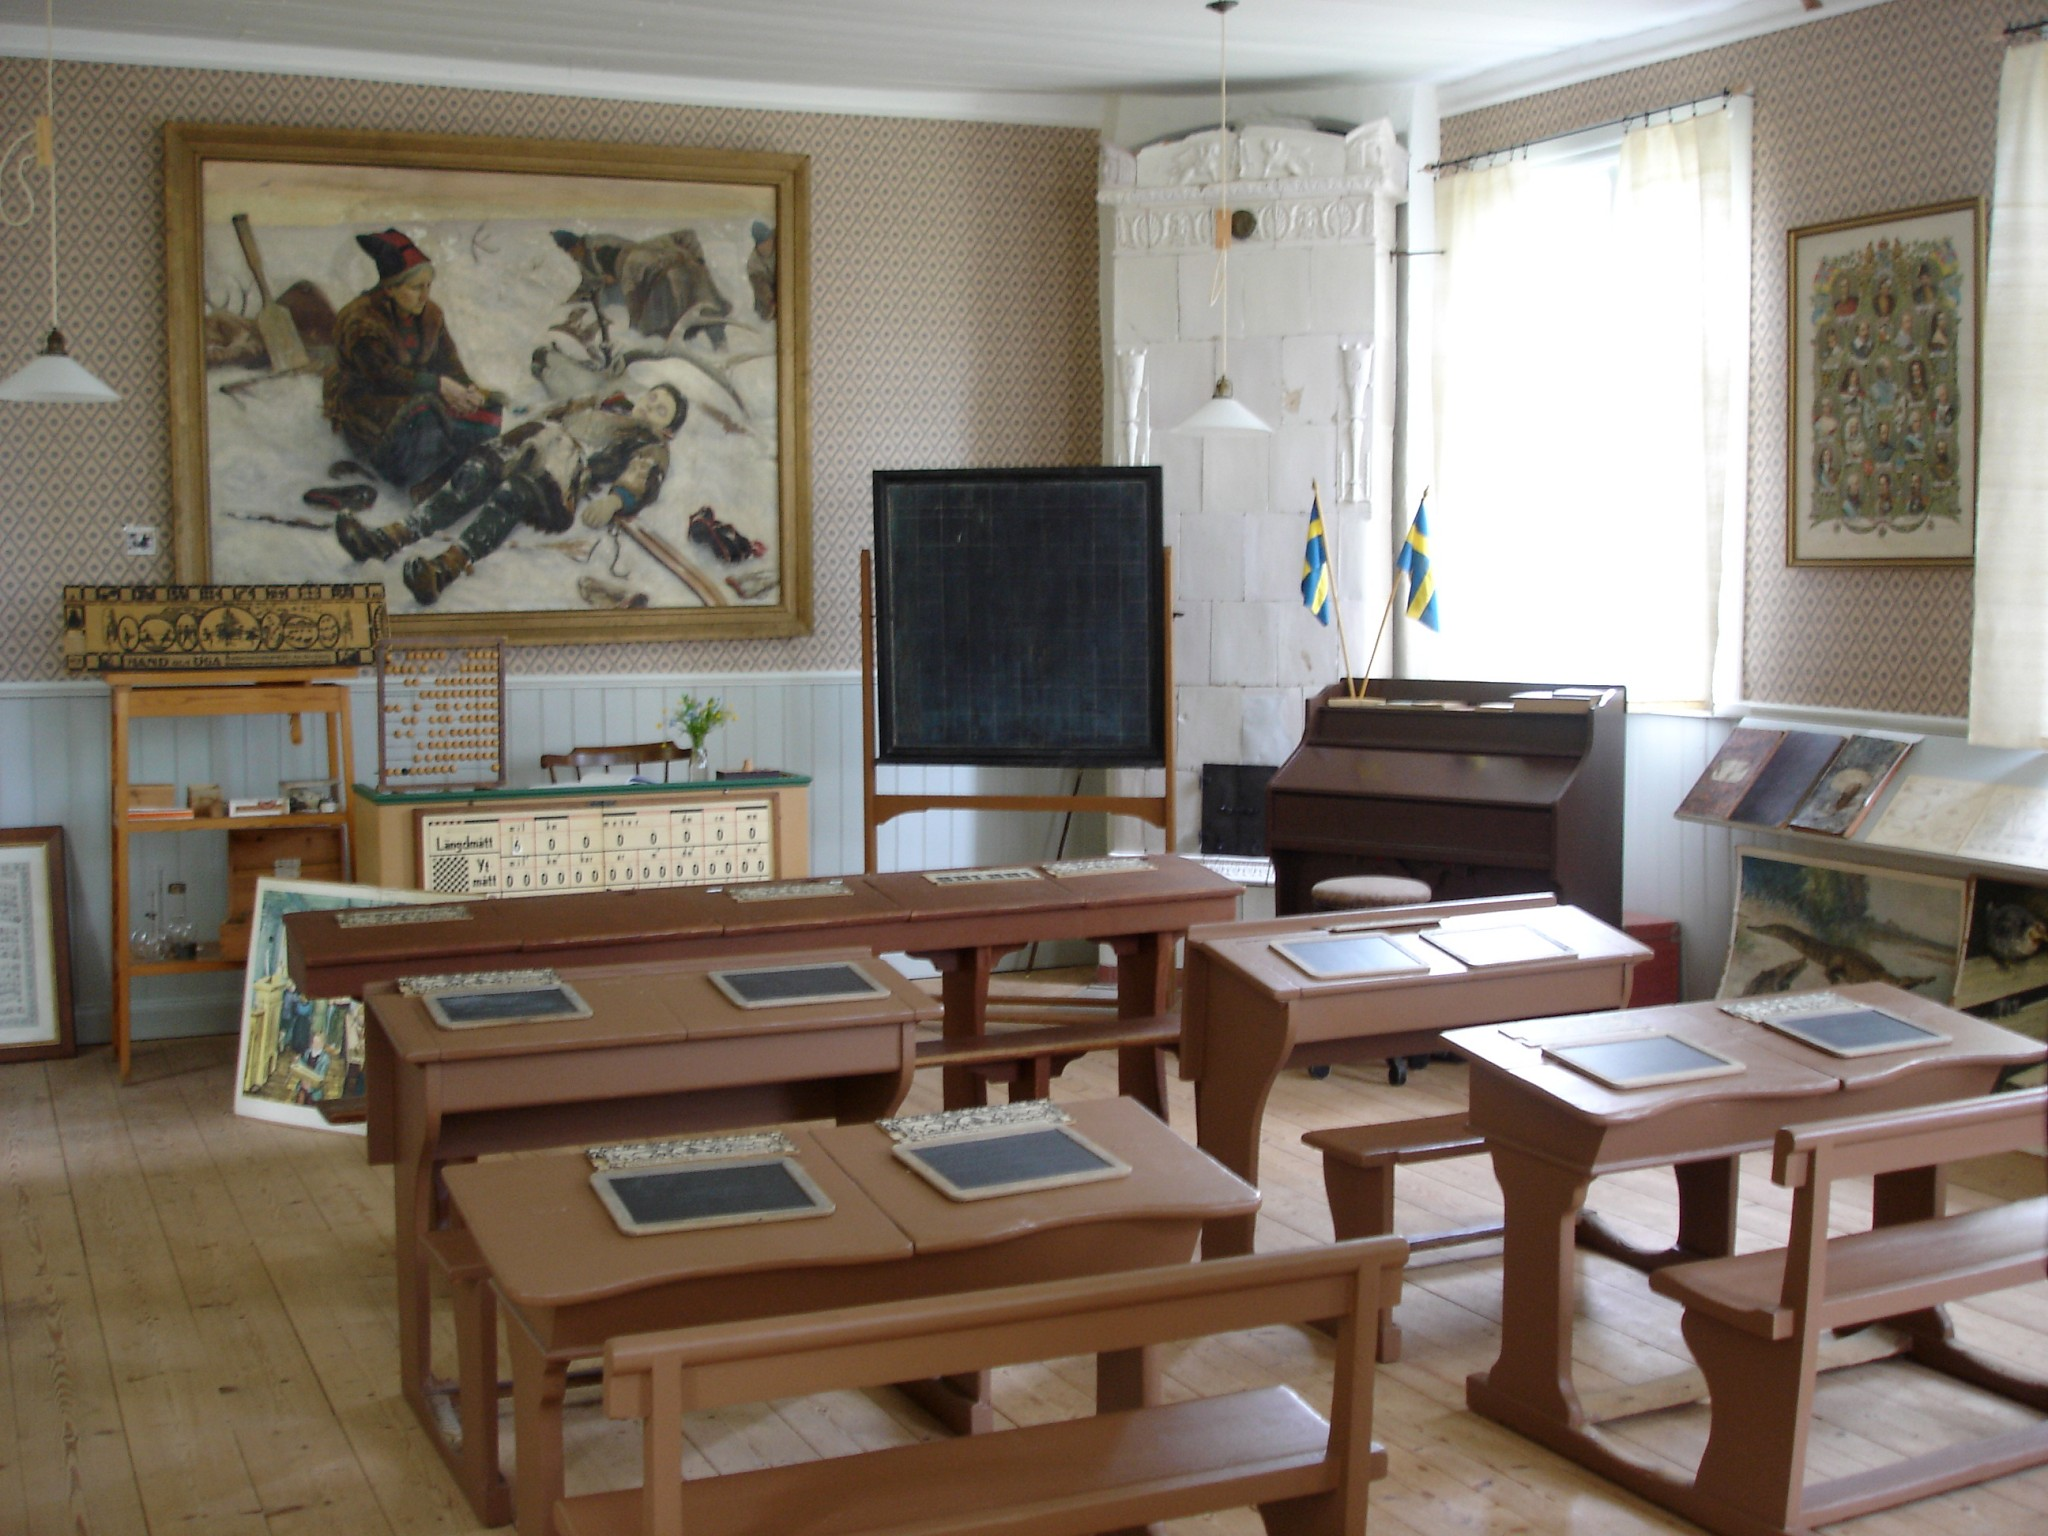 altunaskolmuseum